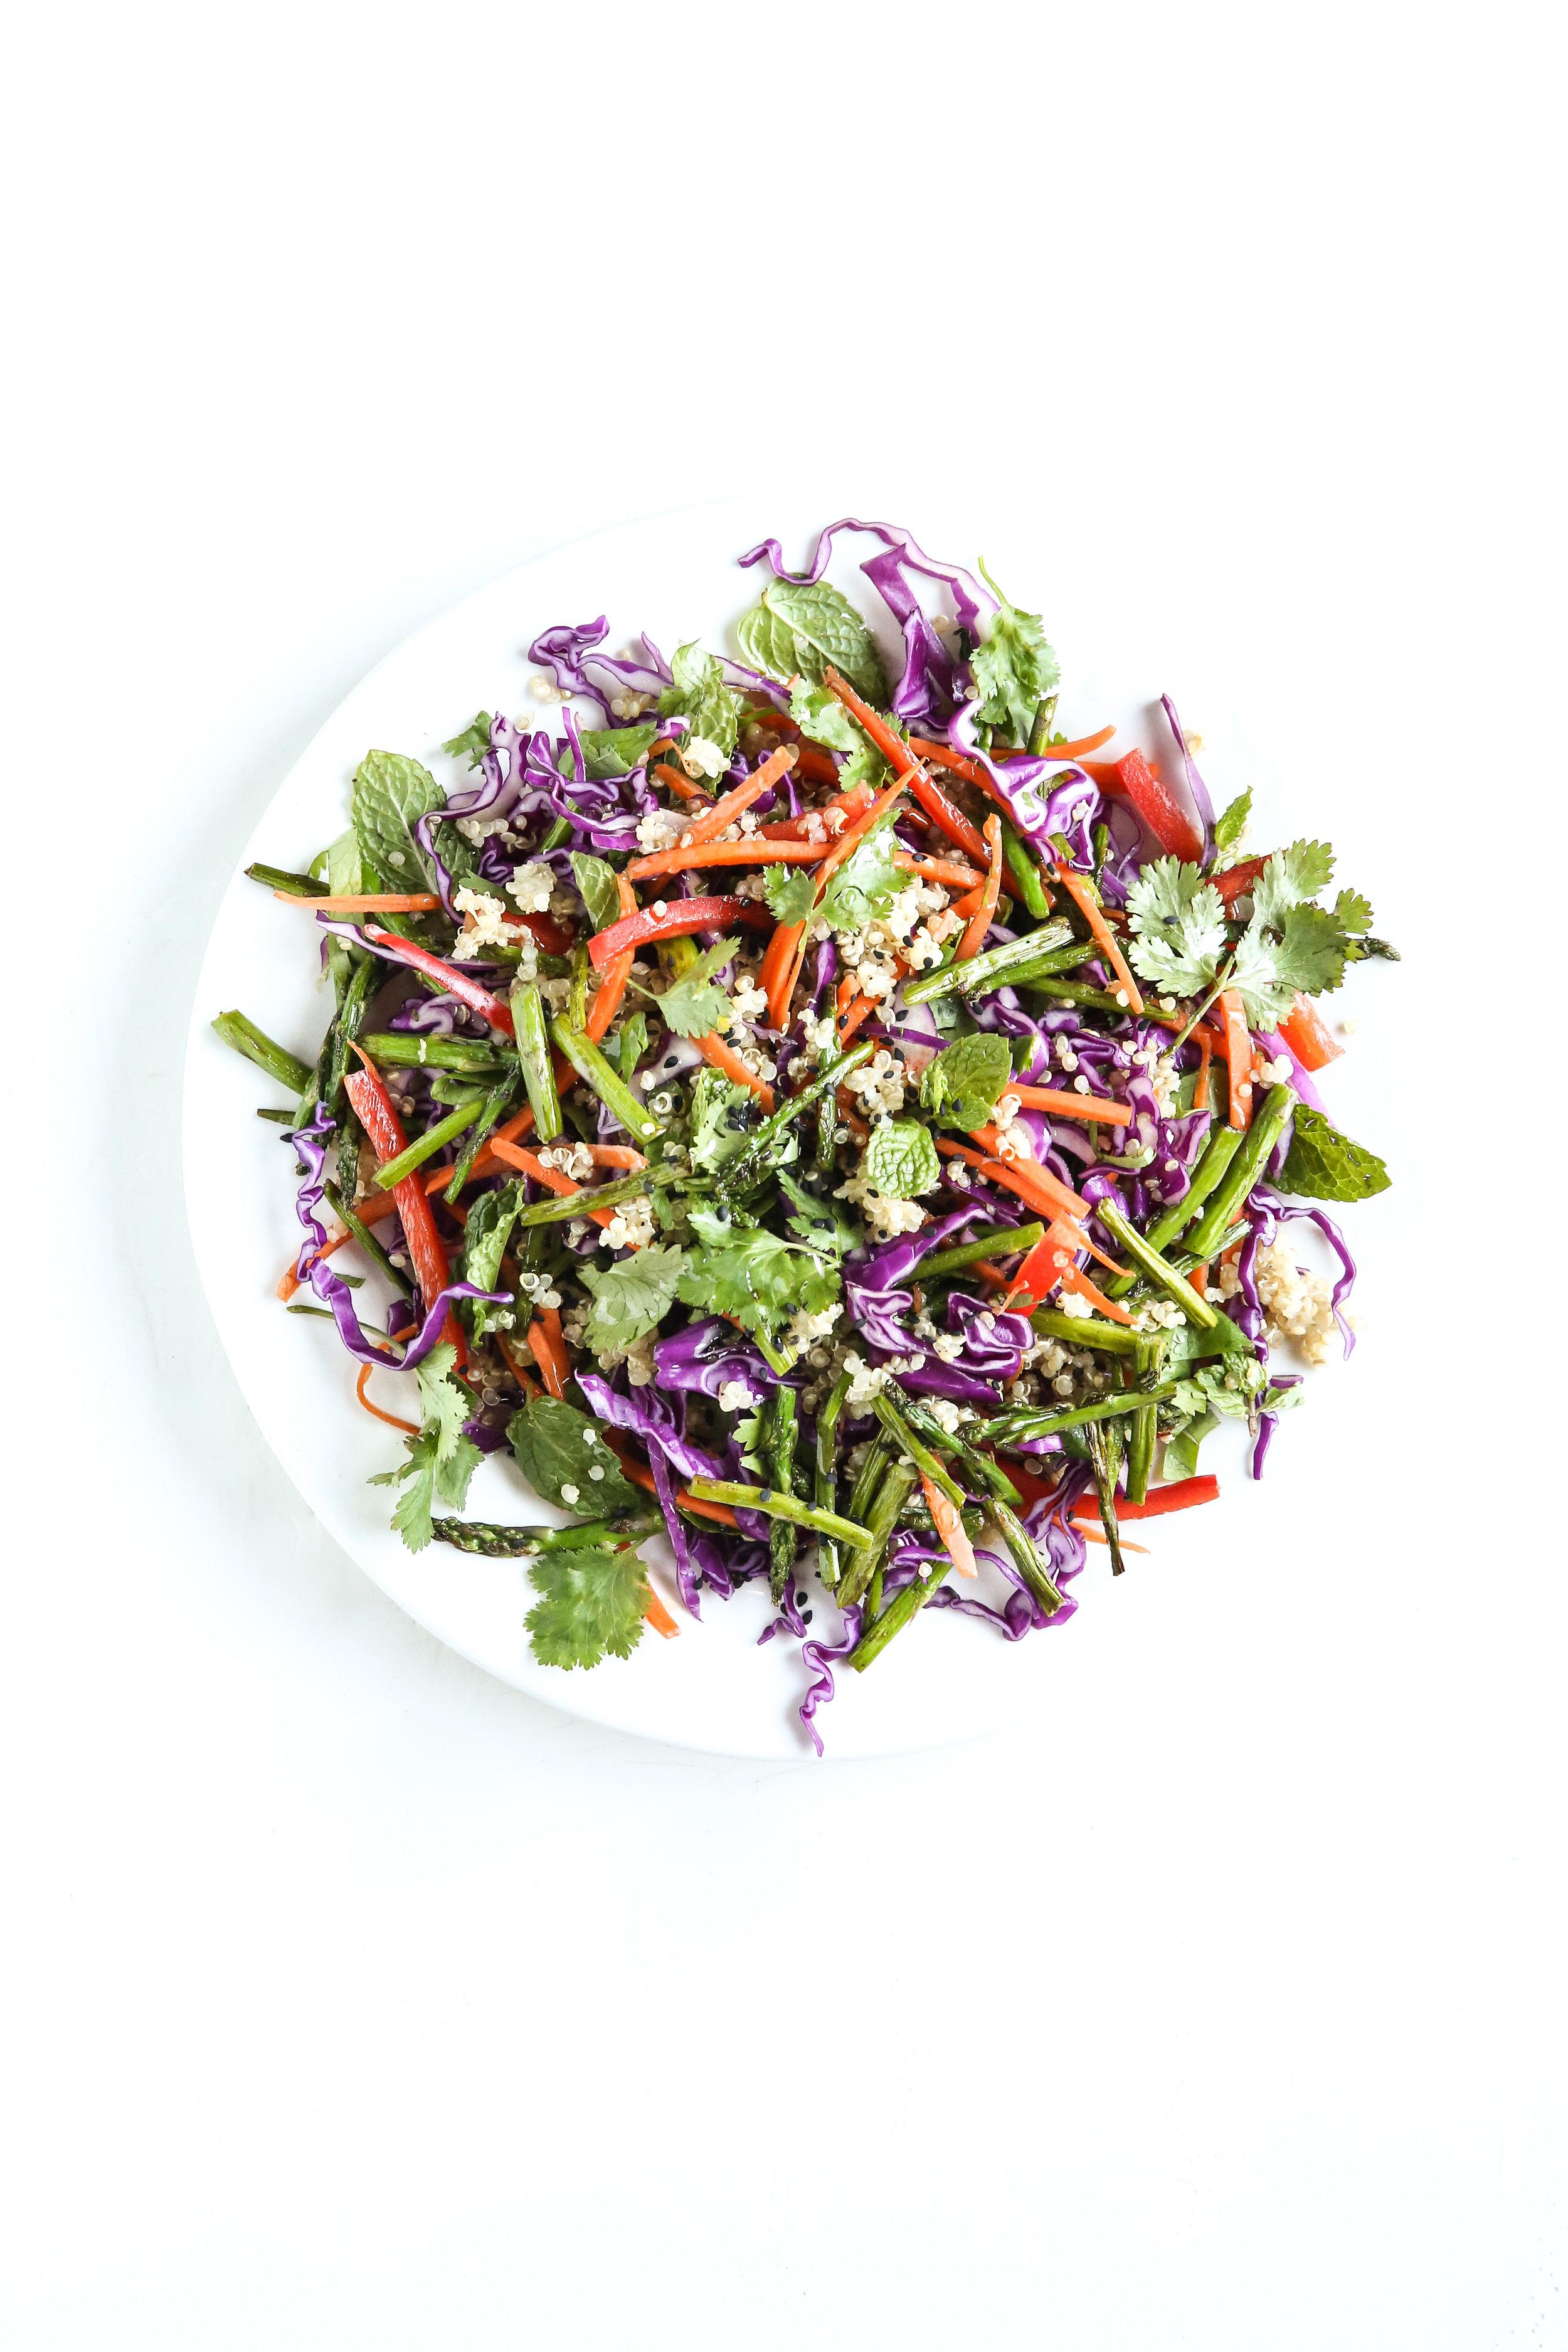 Ginger Garlic Quinoa Salad by Judy Kim